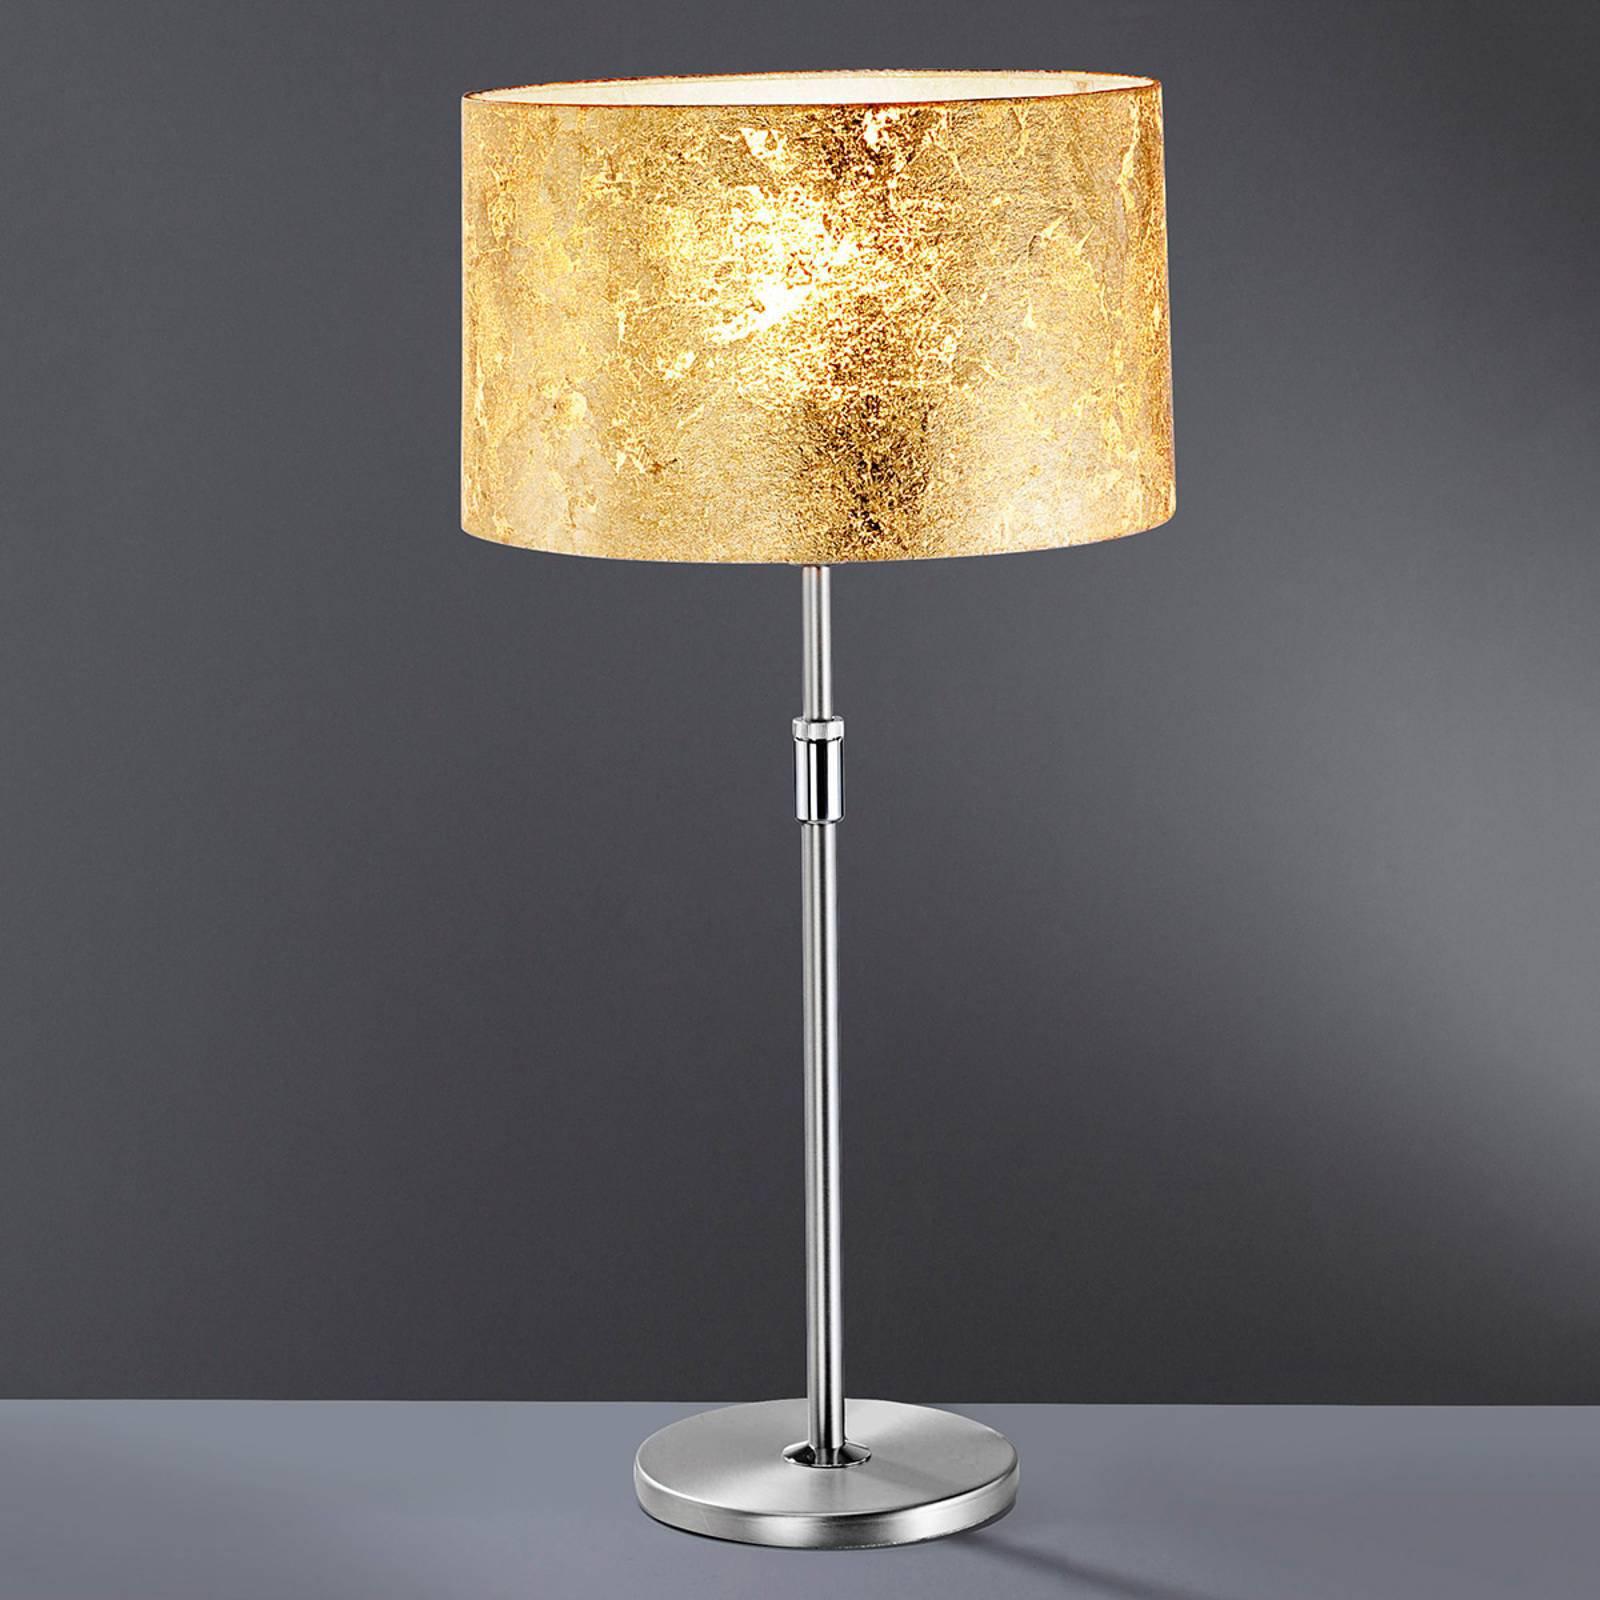 Bordlampe Alea Loop med belegg av bladgull